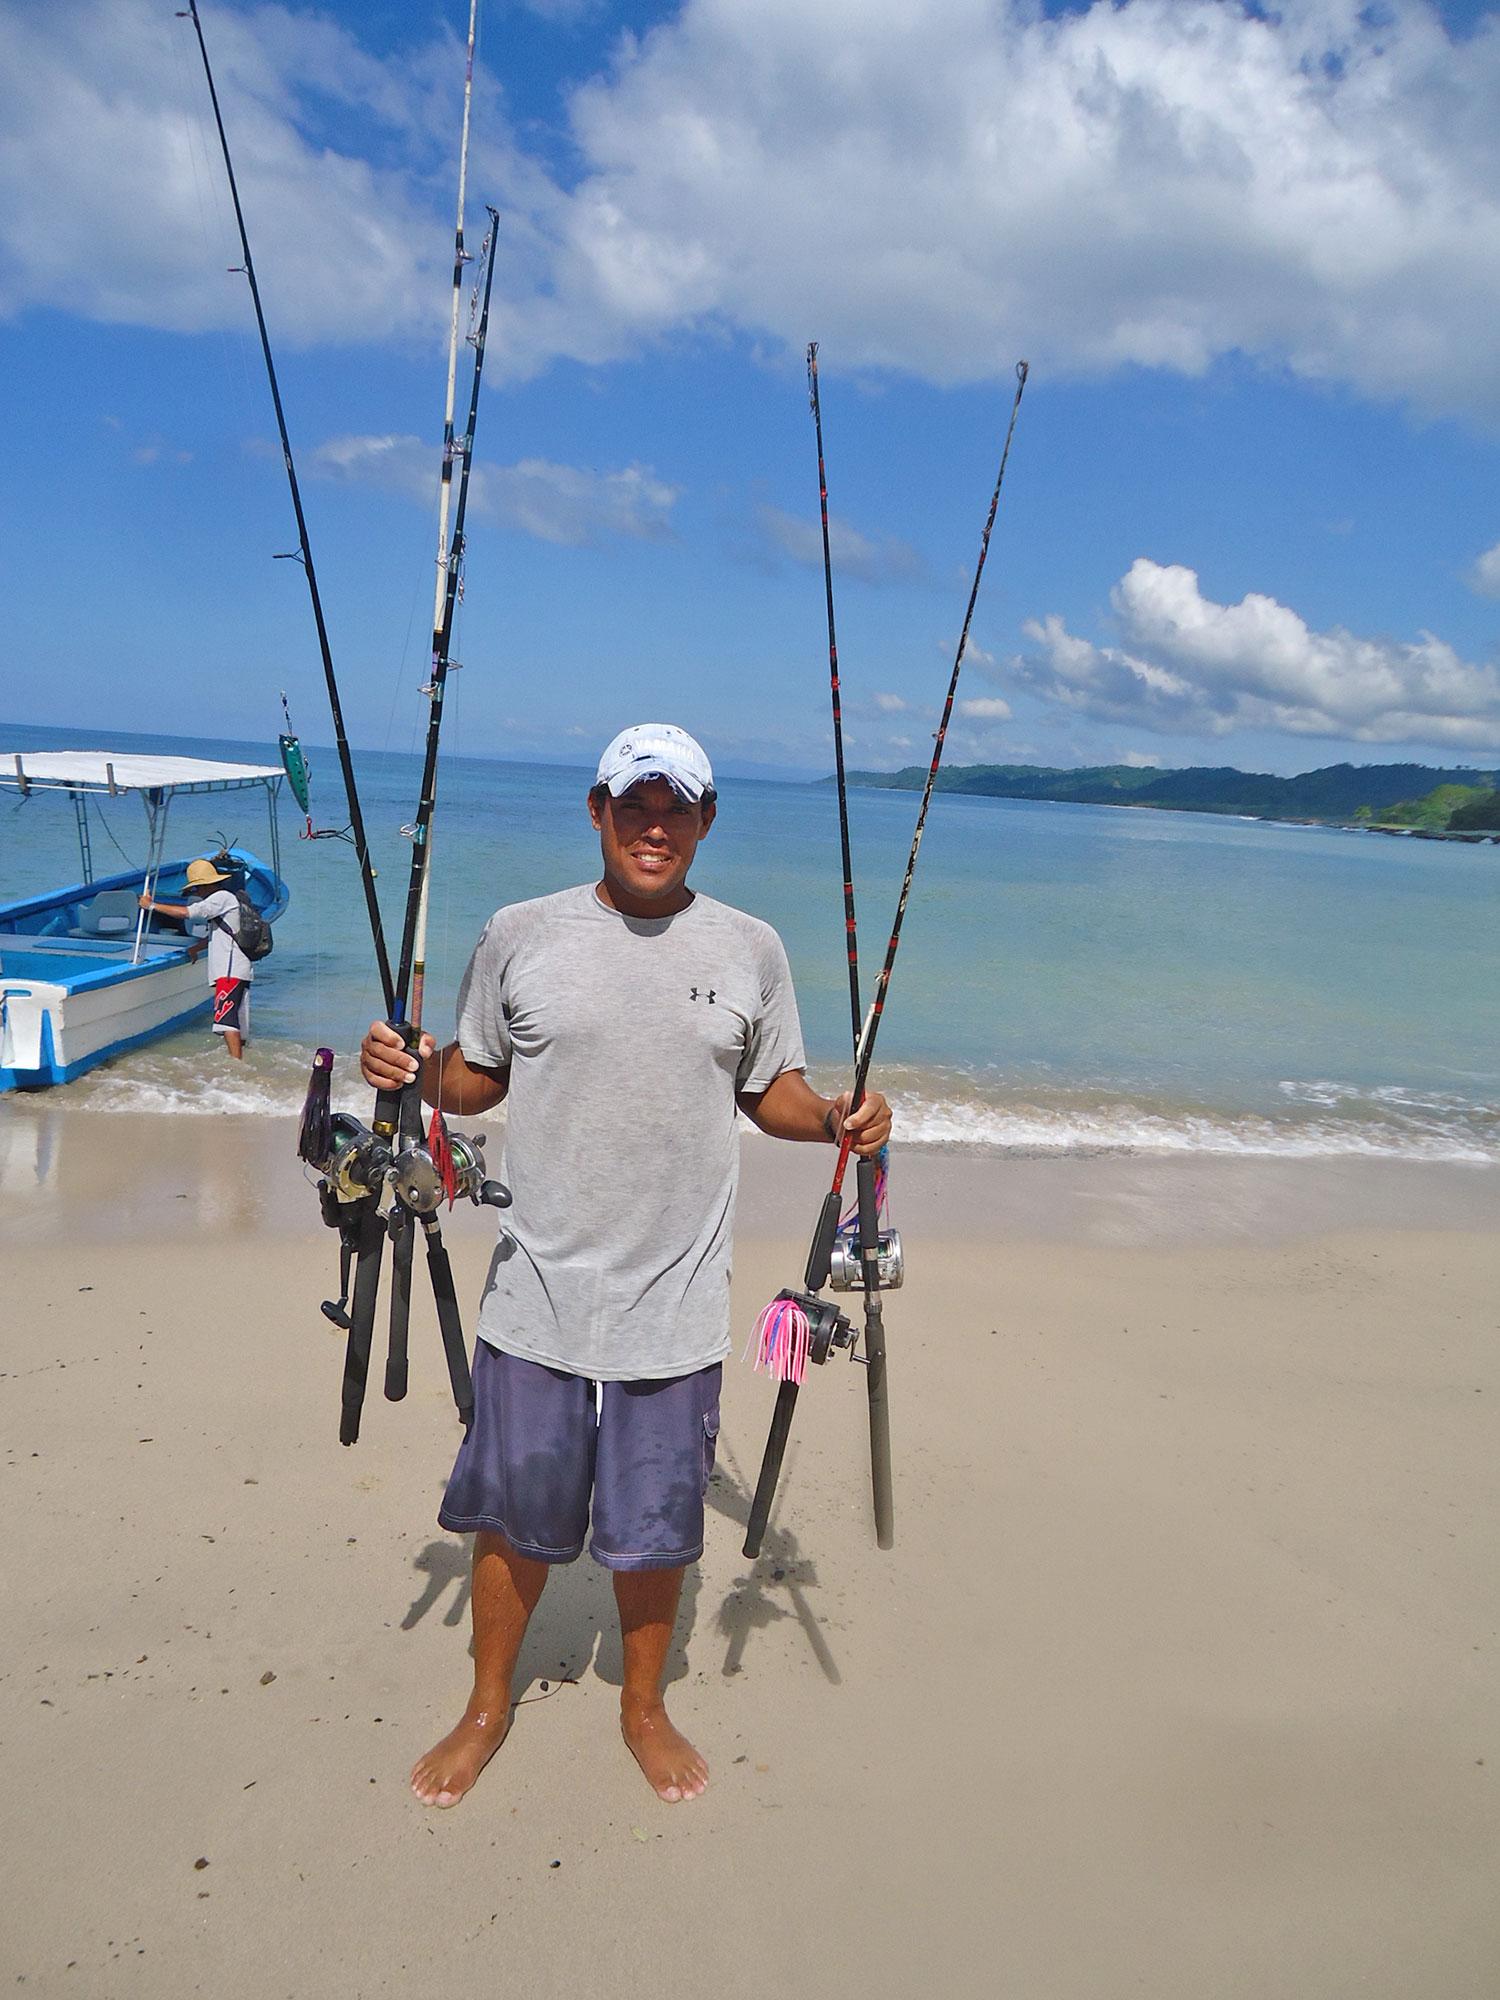 Getting the Fishing Gear Ready